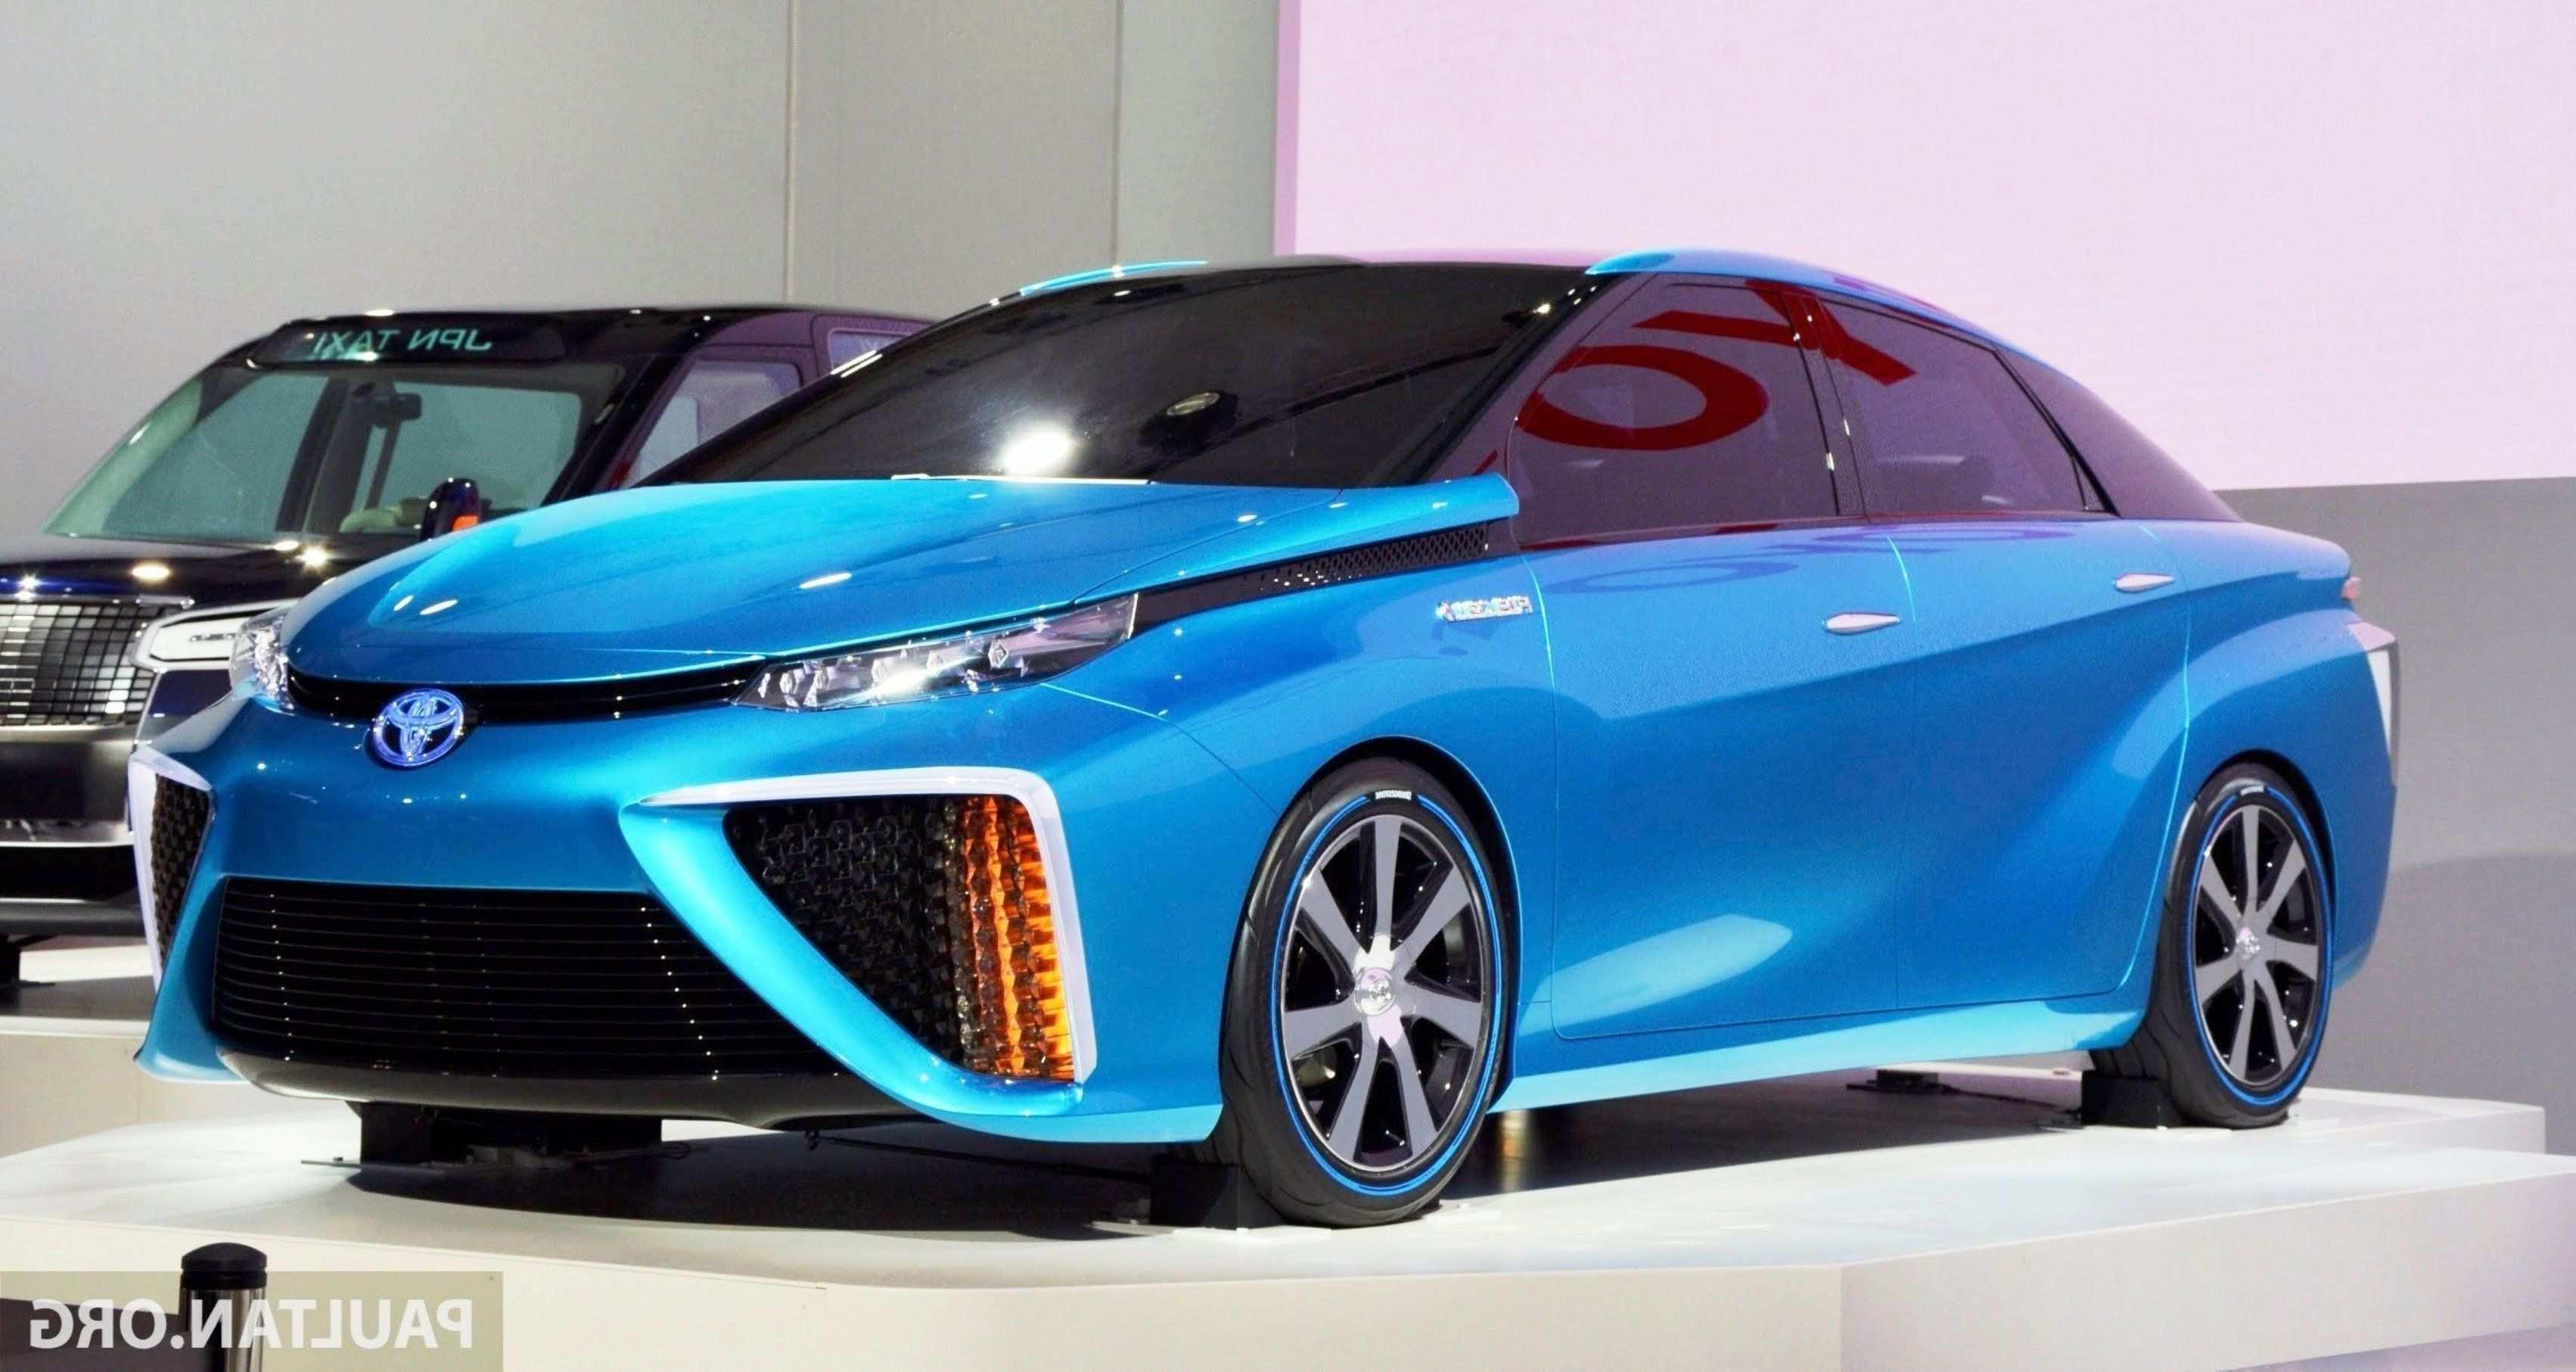 77 Concept of Avalon Toyota 2020 New Concept Exterior and Interior by Avalon Toyota 2020 New Concept